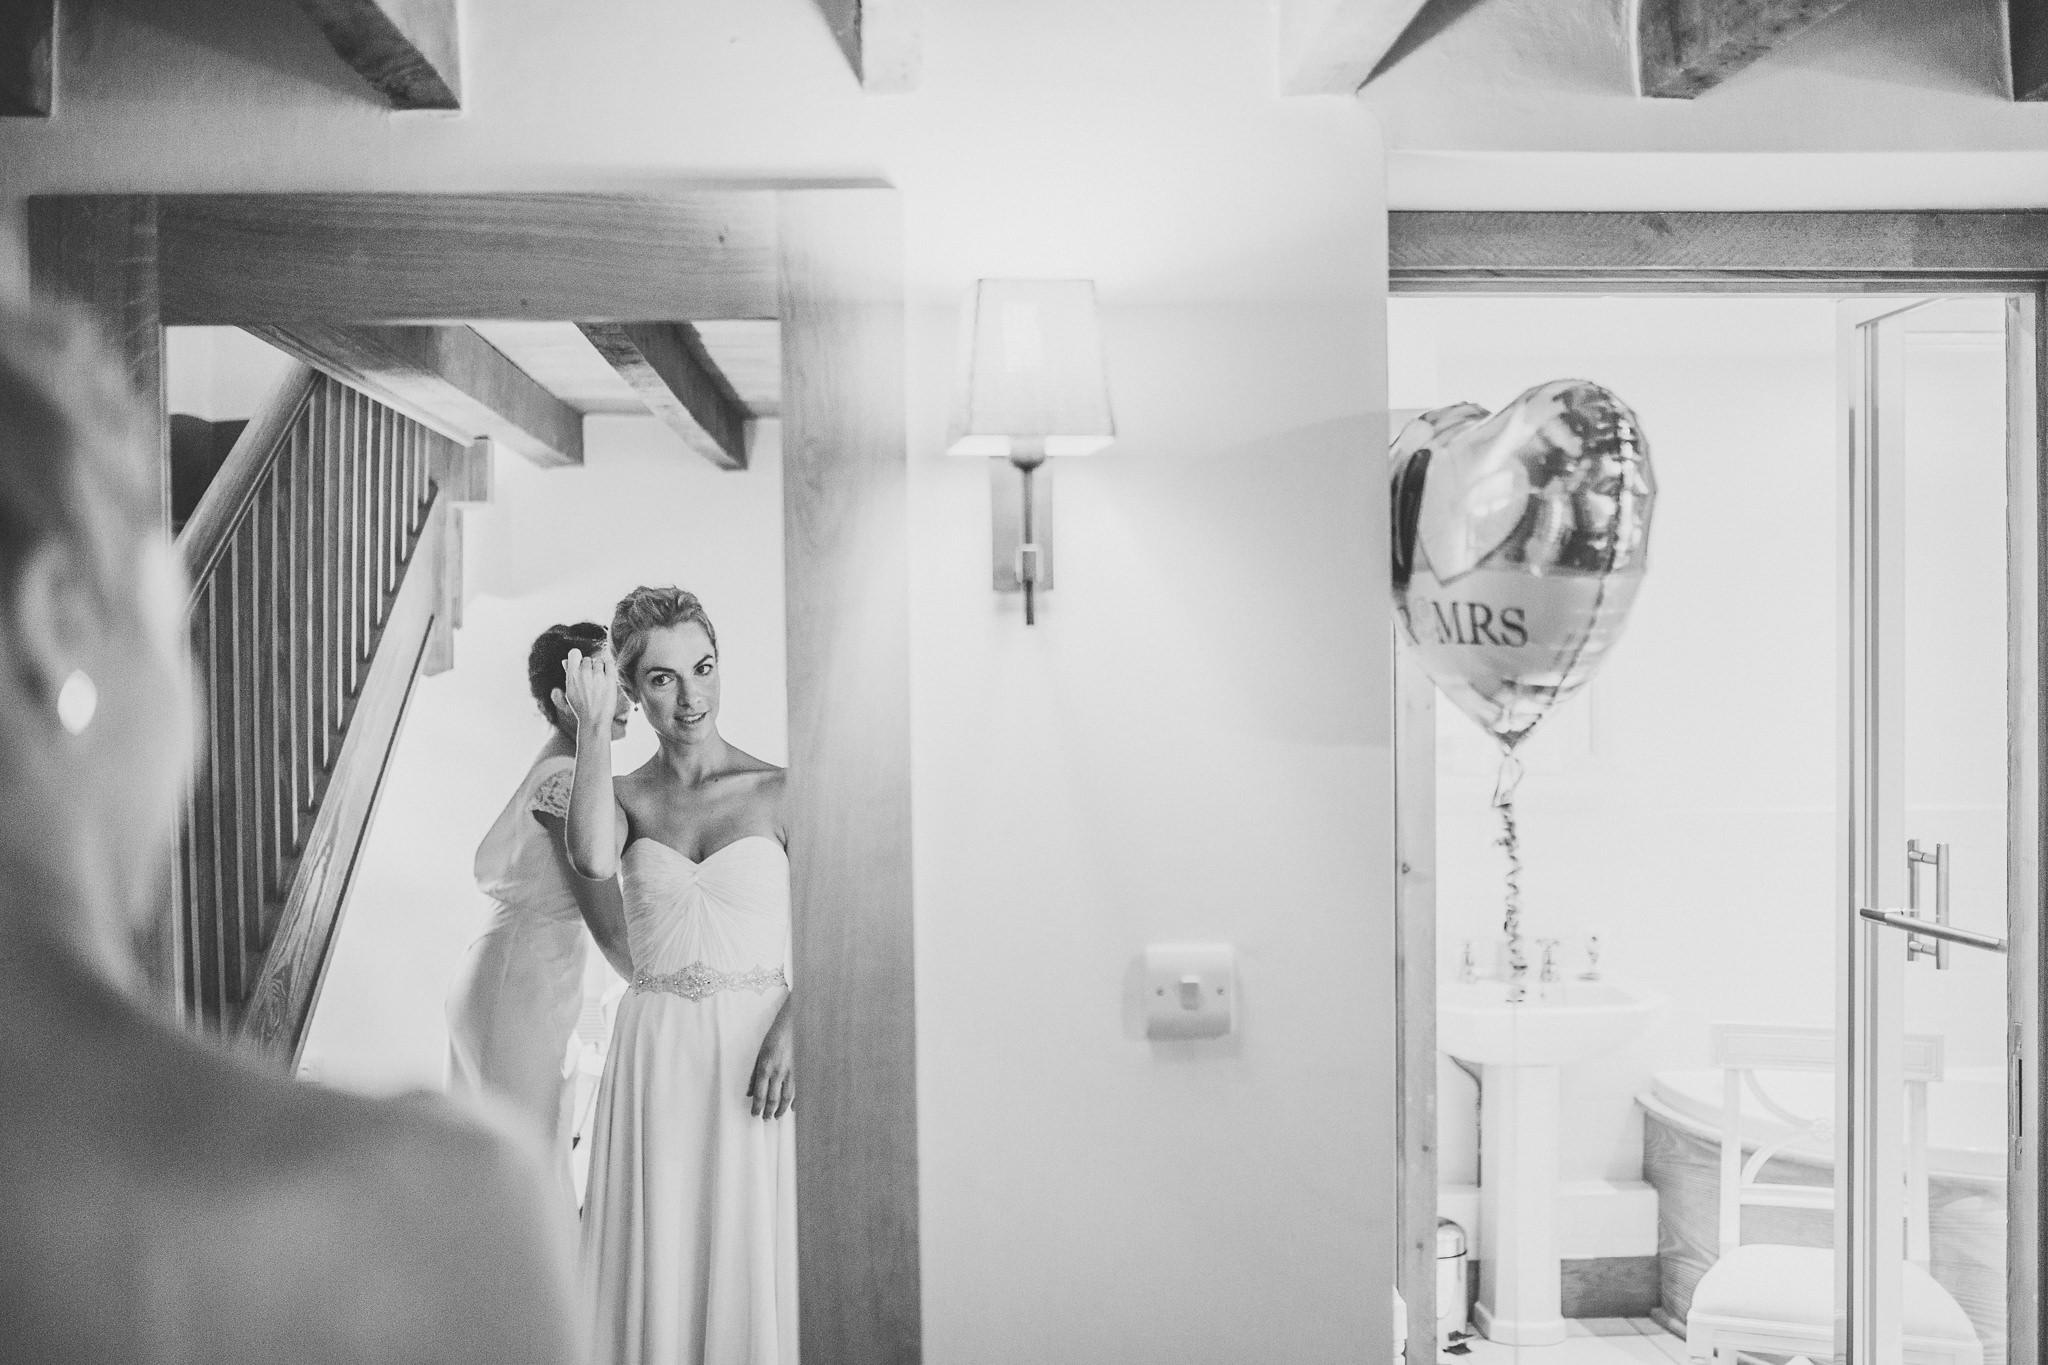 paul-marbrook-Gaynes-Park Wedding-Photographer-90023